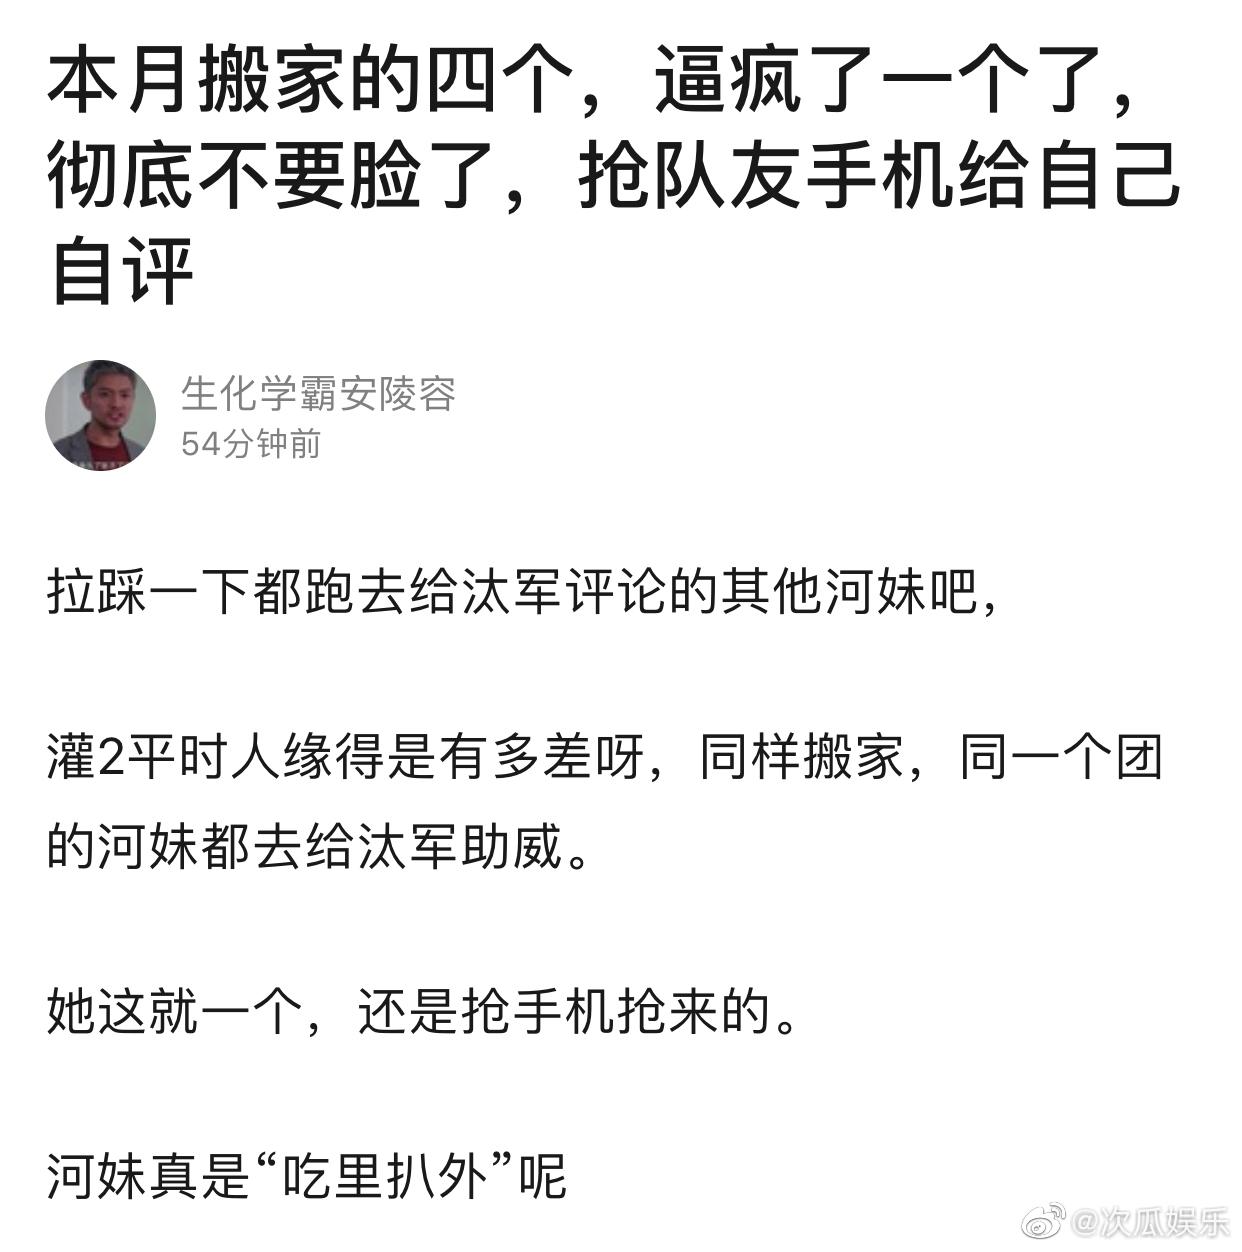 BEJ48陈倩楠说硬糖少女303赵粤抢她手机给自己微博评论